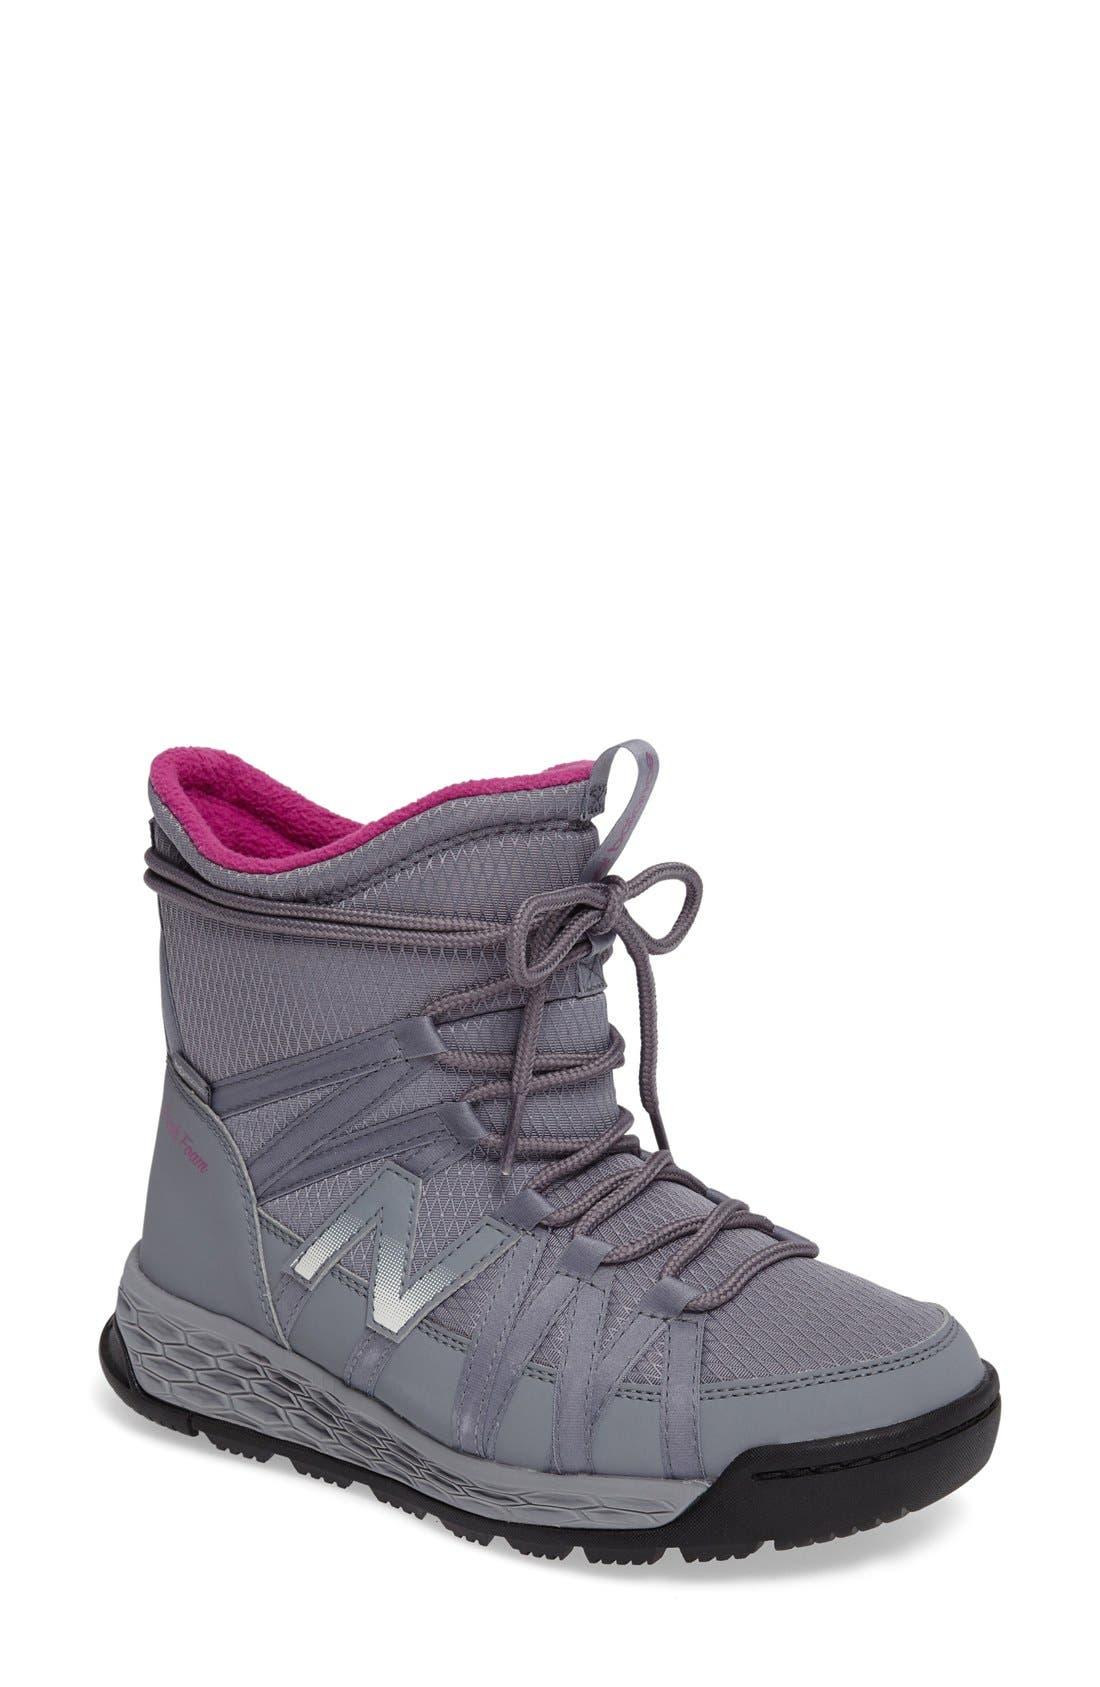 Q416 Weatherproof Snow Boot,                             Main thumbnail 2, color,